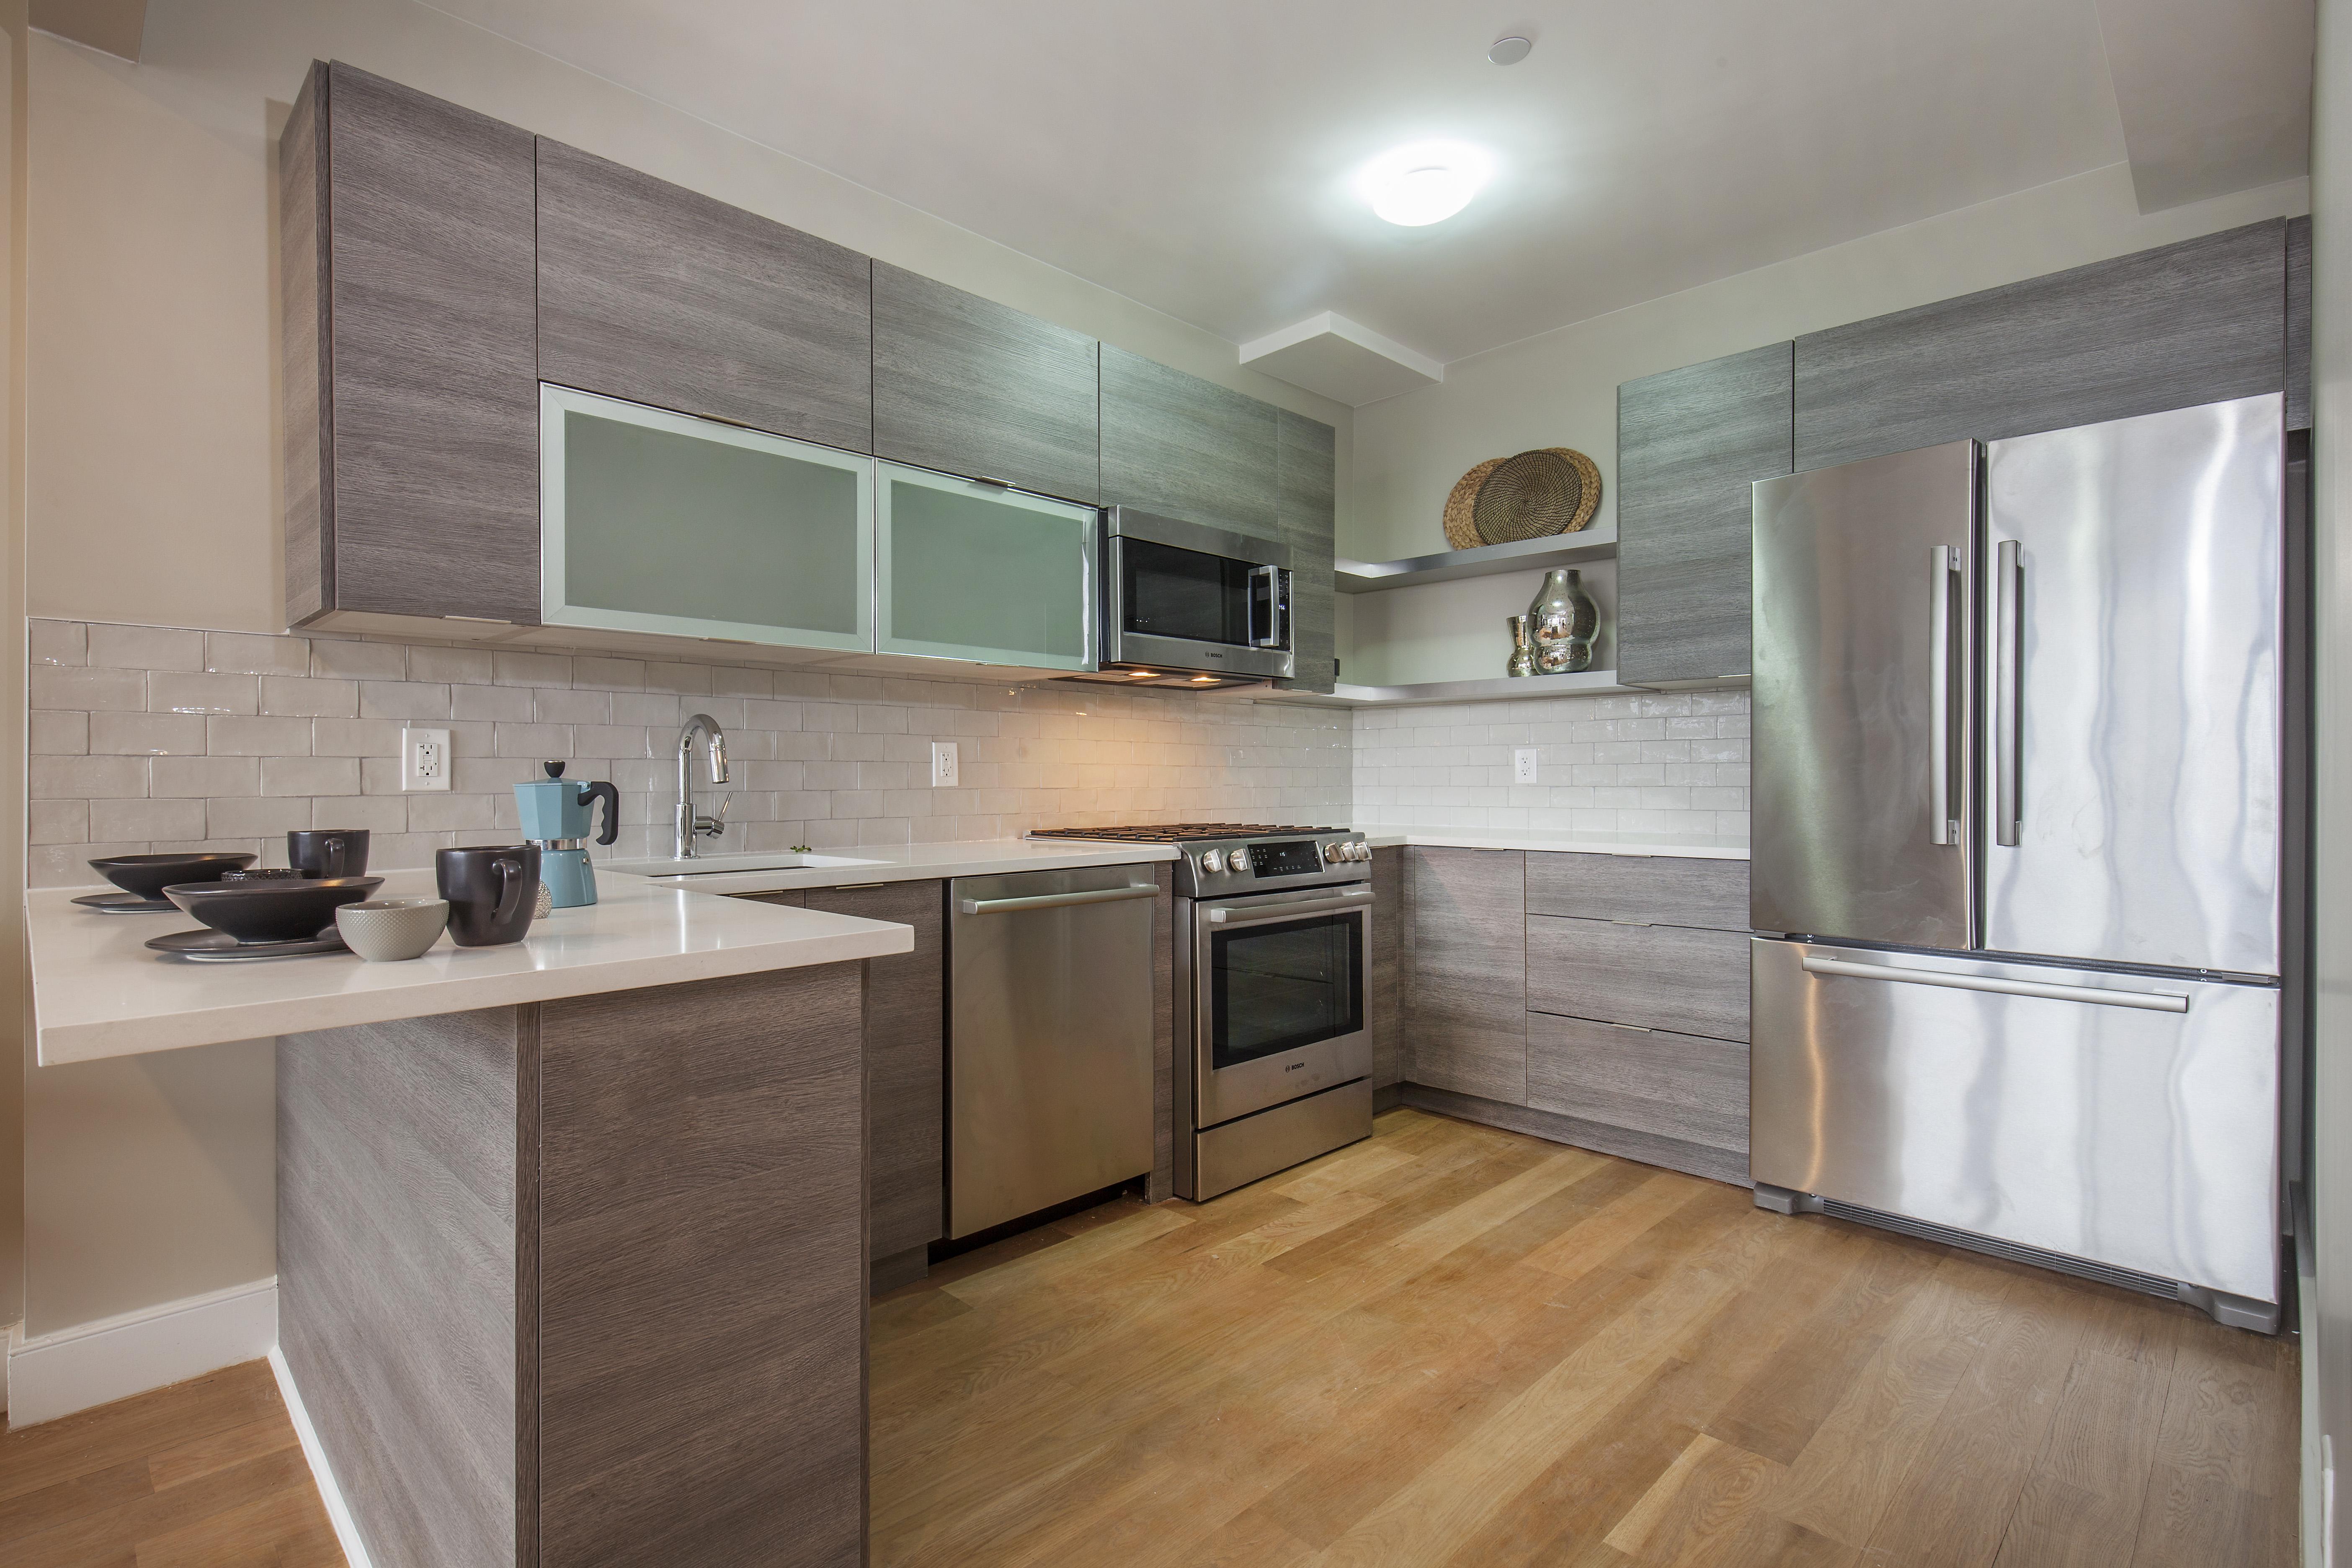 Douglas Elliman Presents: New residential development in Clinton Hill, Brooklyn